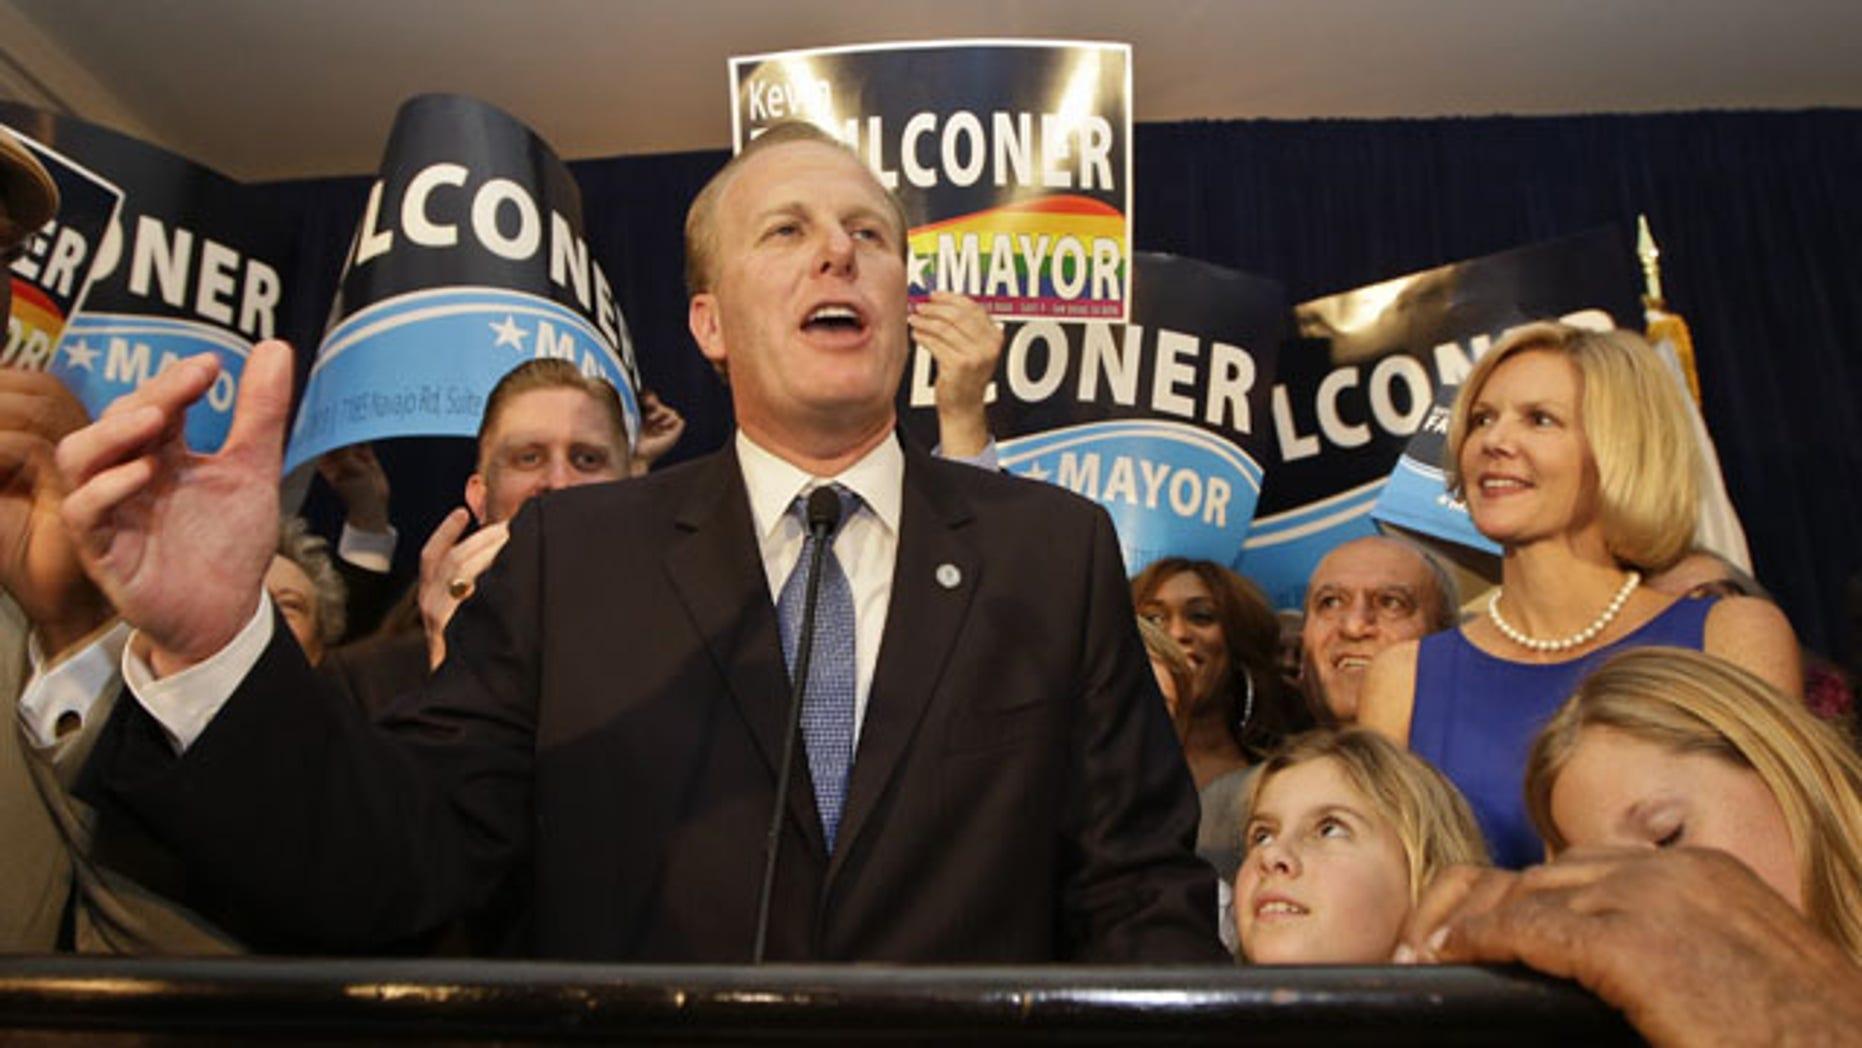 February 11, 2014: San Diego mayoral candidate Kevin Faulconer addresses supporters. (AP Photo/Lenny Ignelzi)